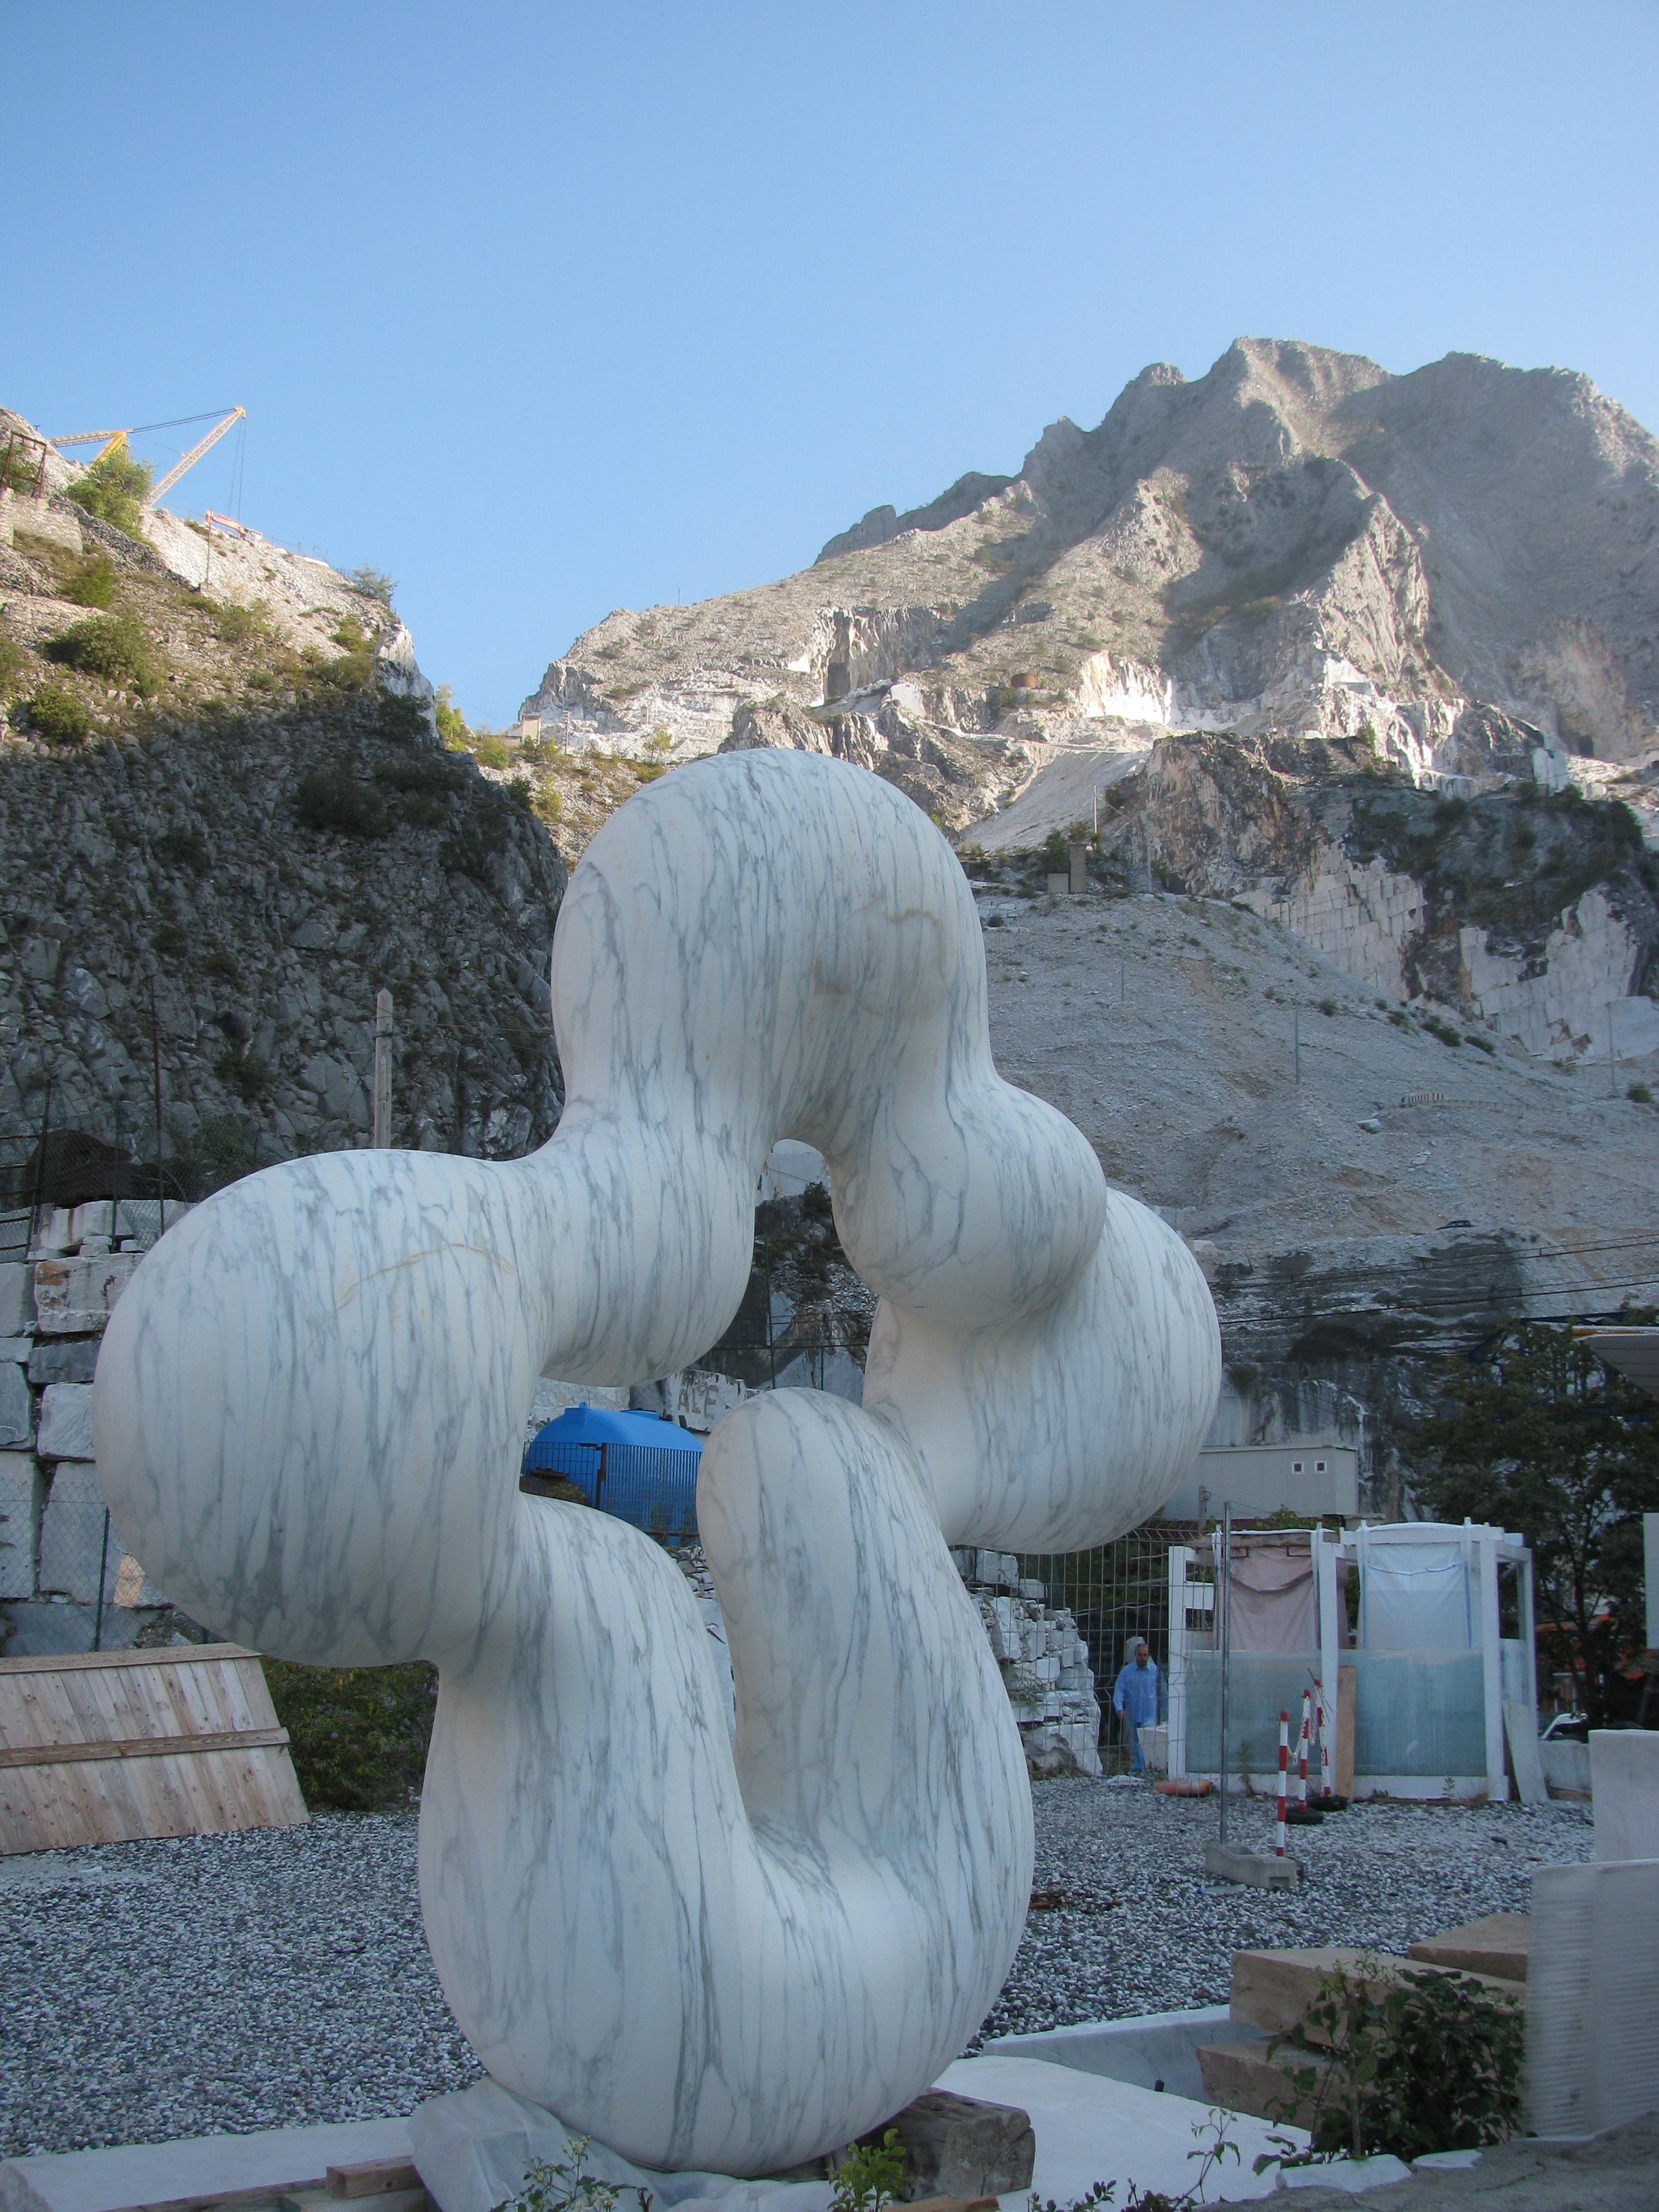 Marble Sculpture Fantiscritti quarry